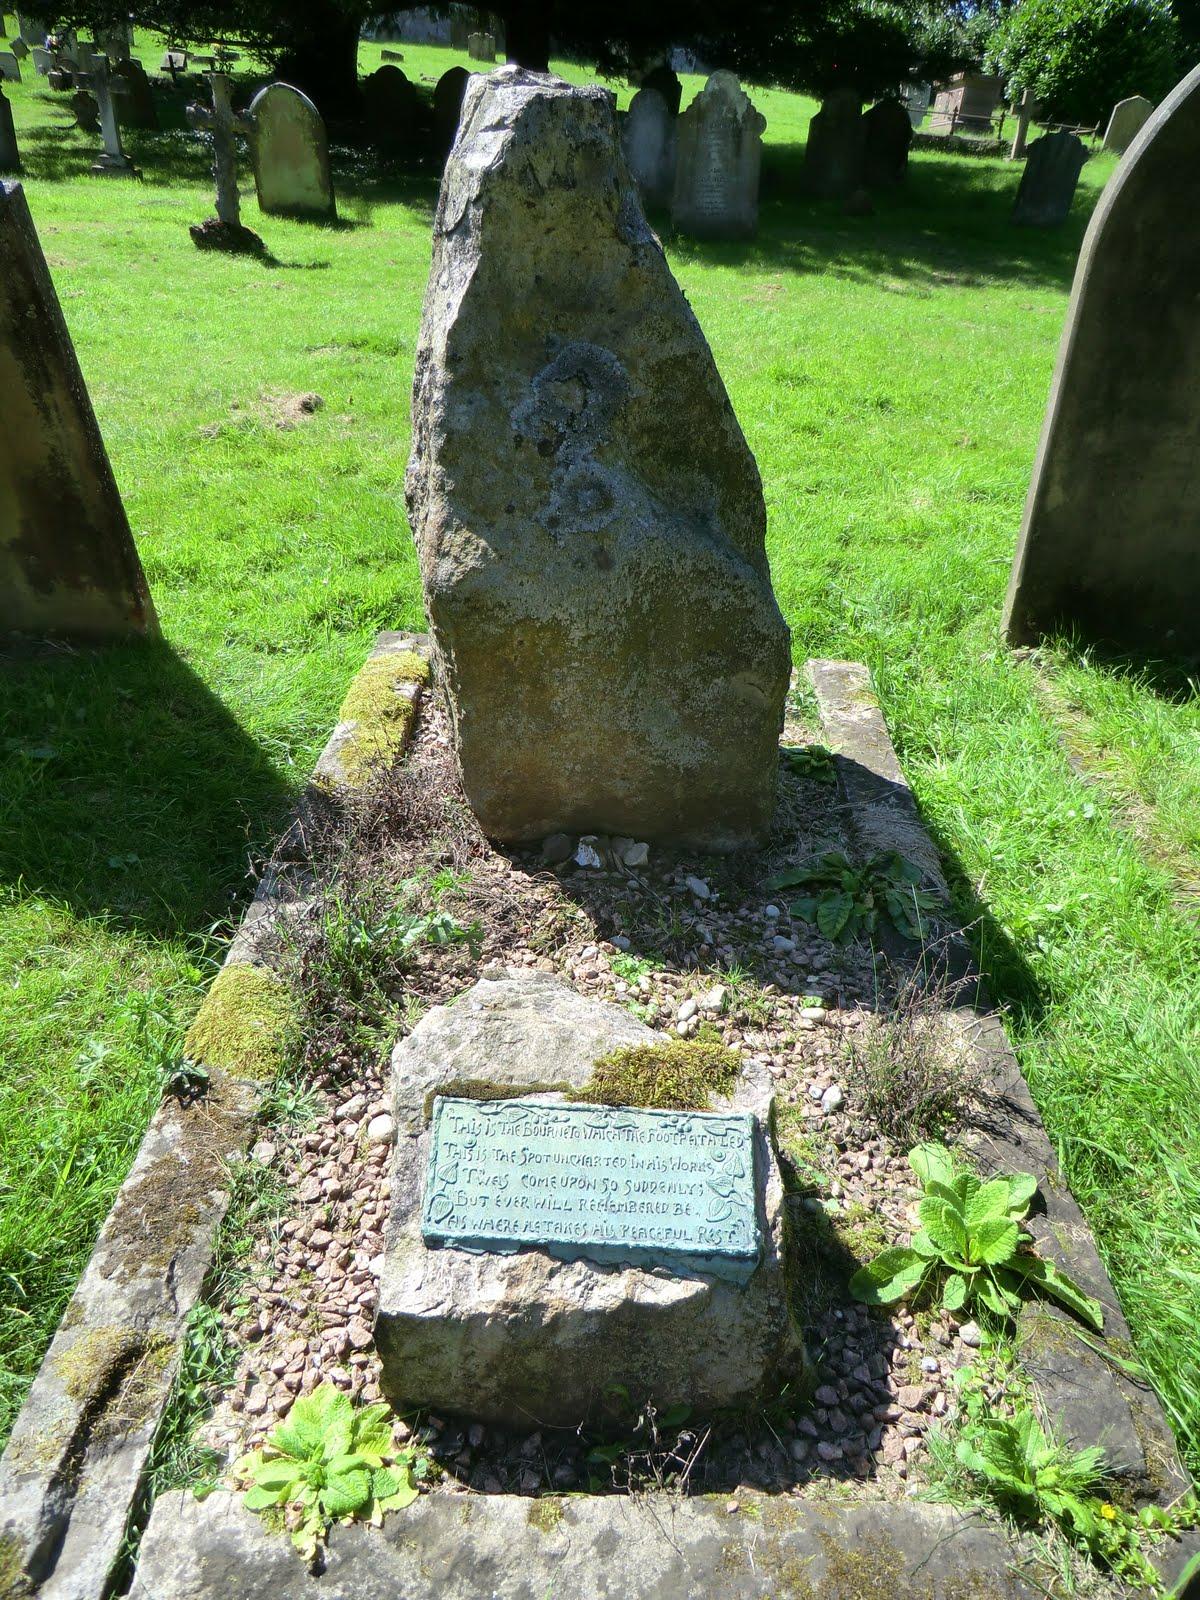 CIMG3136 Sarsen stone memorial, St Nicholas' churchyard